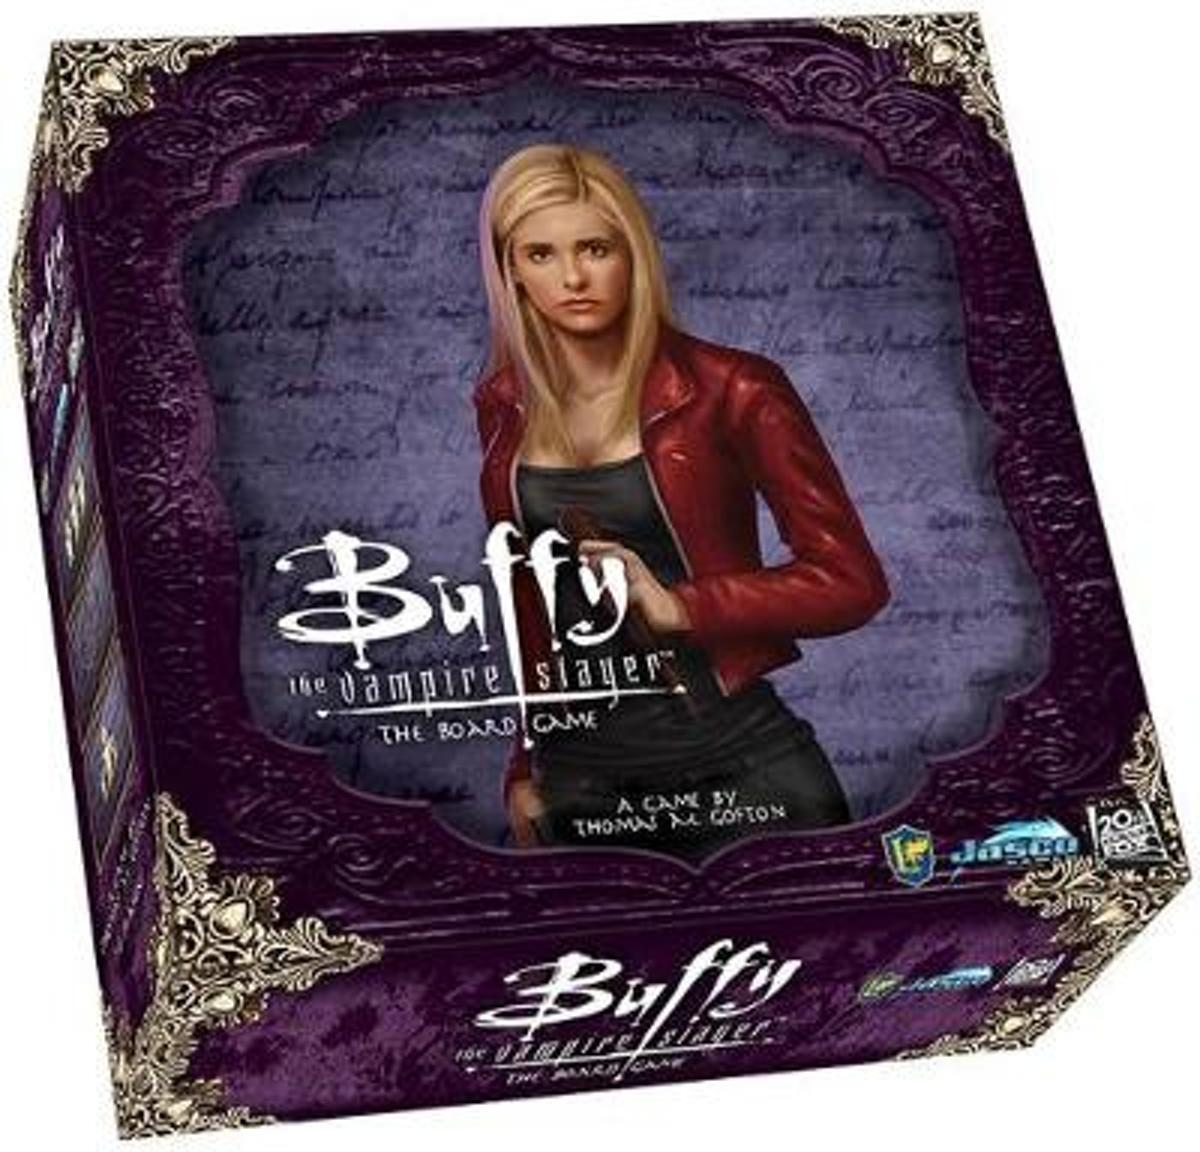 Buffy The Vampire Slayer (Boardgame)